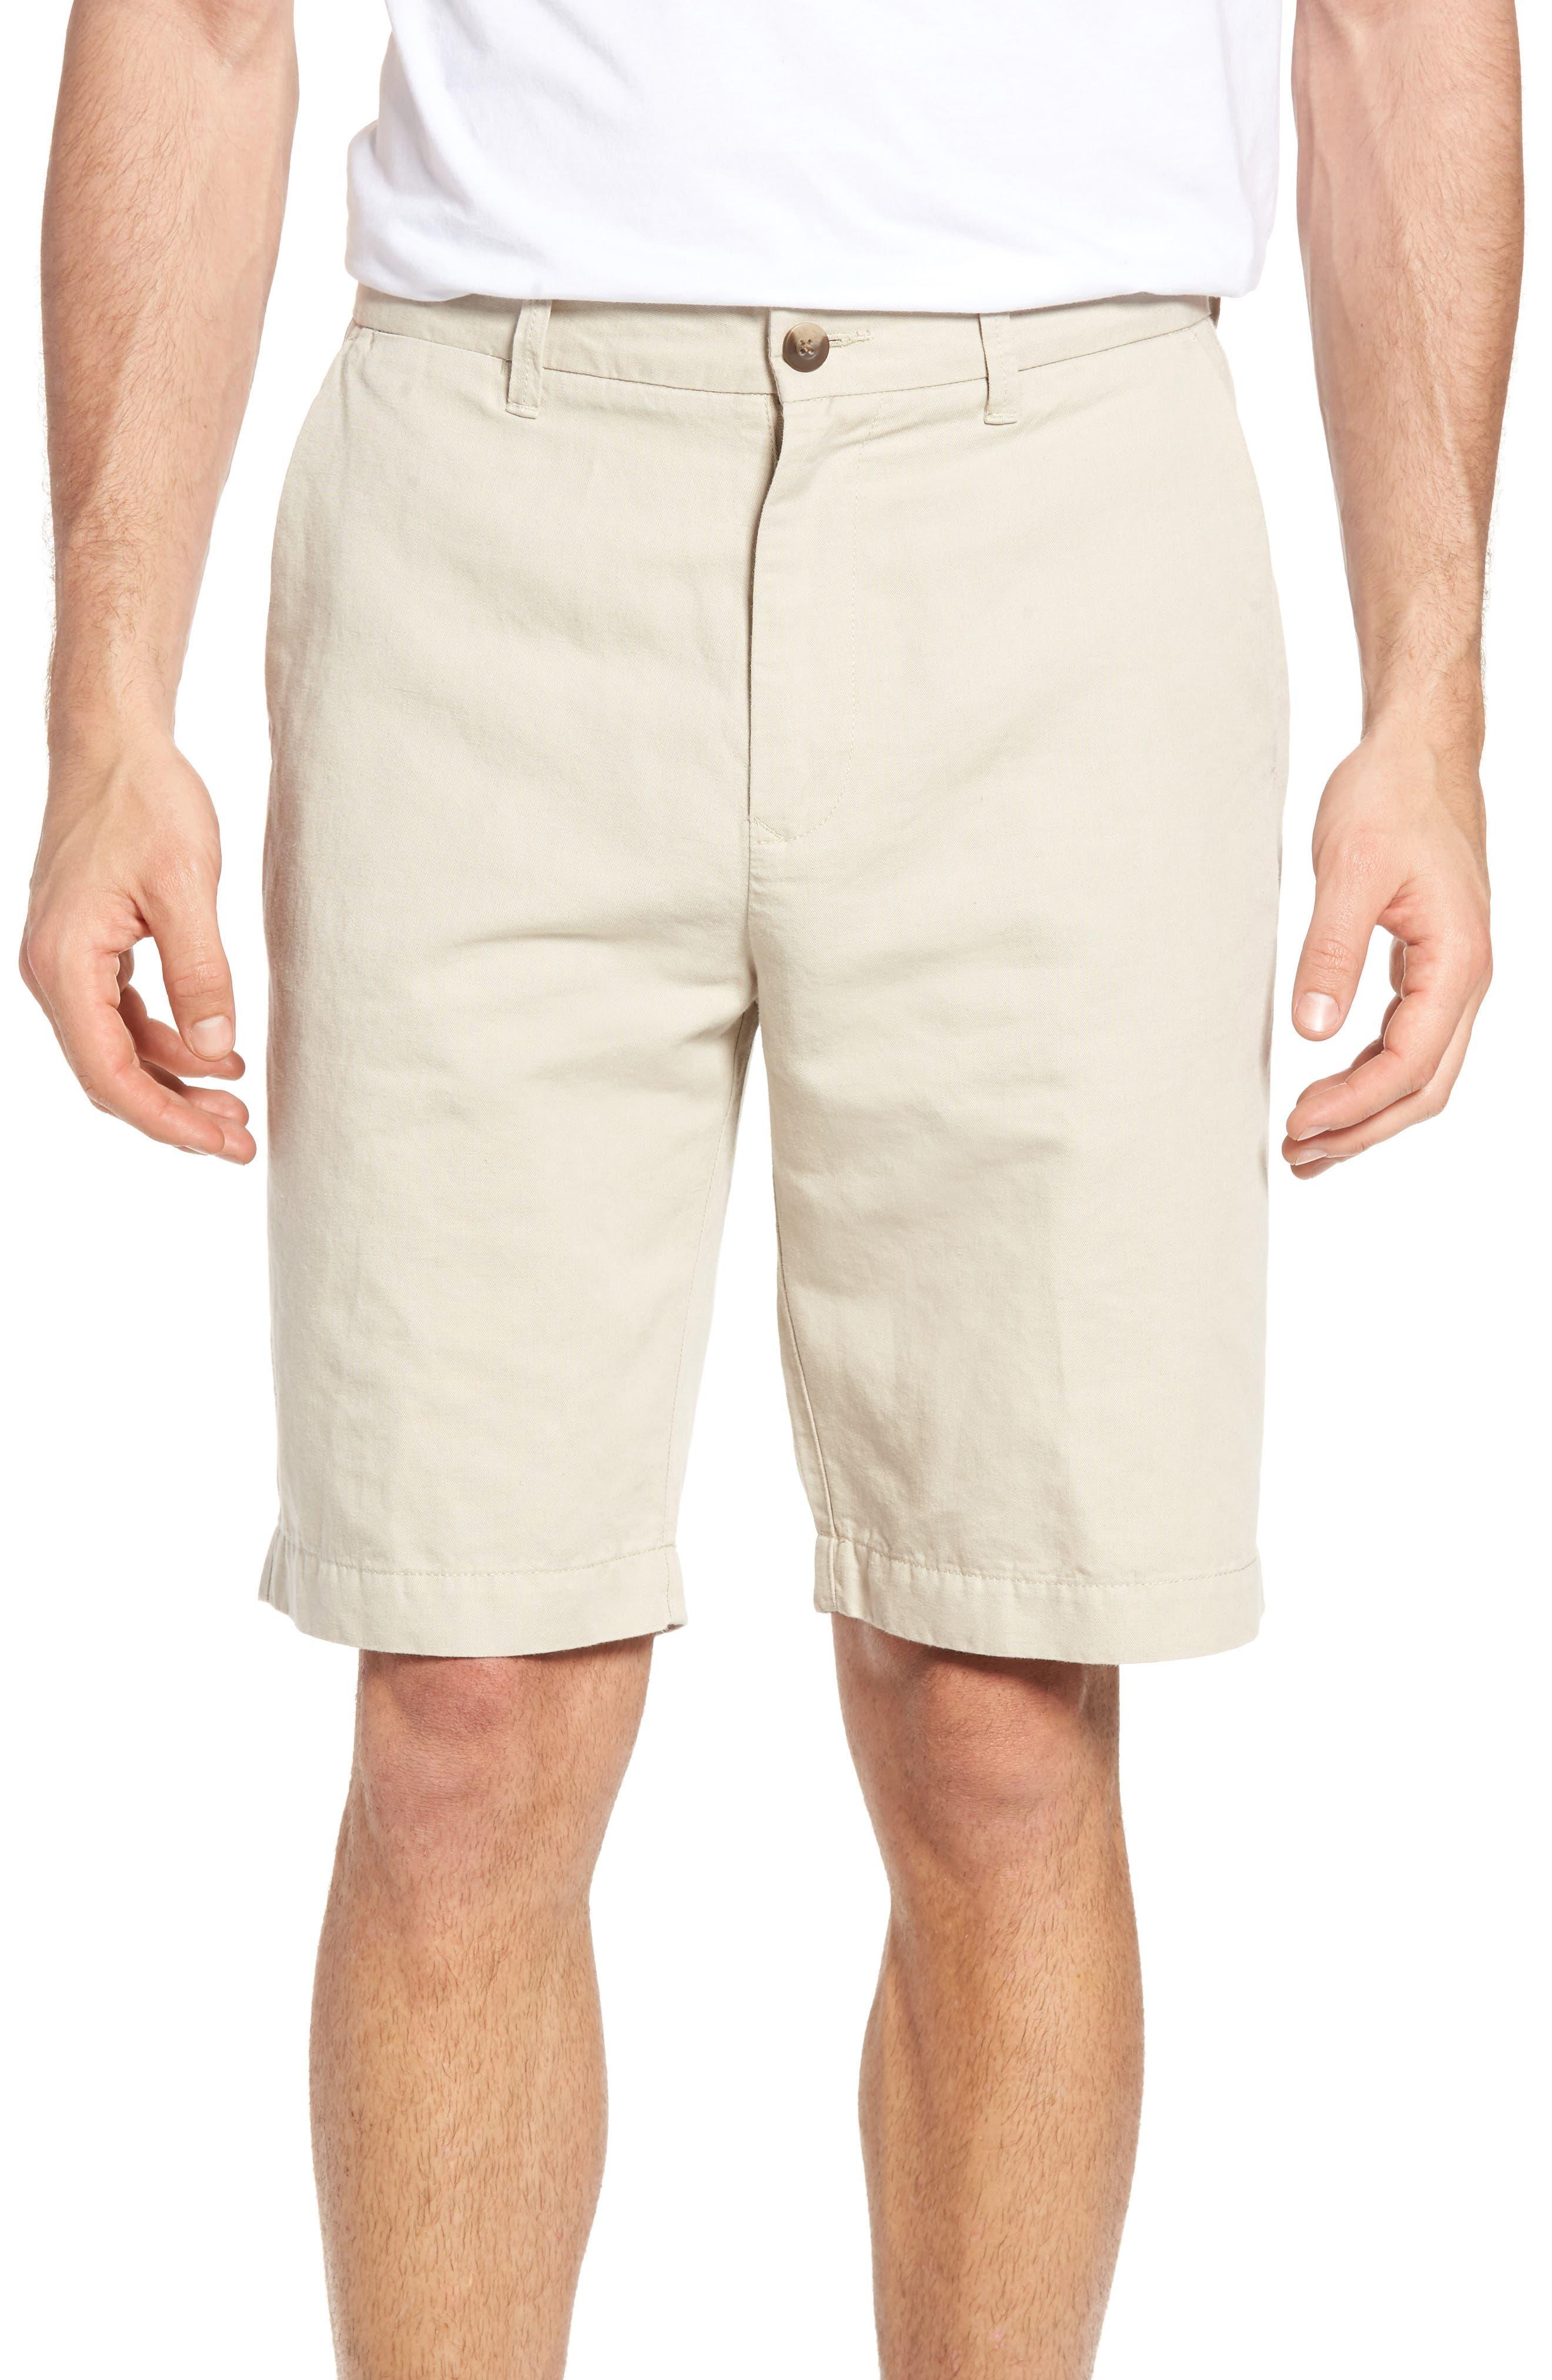 Rolleston Shorts,                         Main,                         color, 253